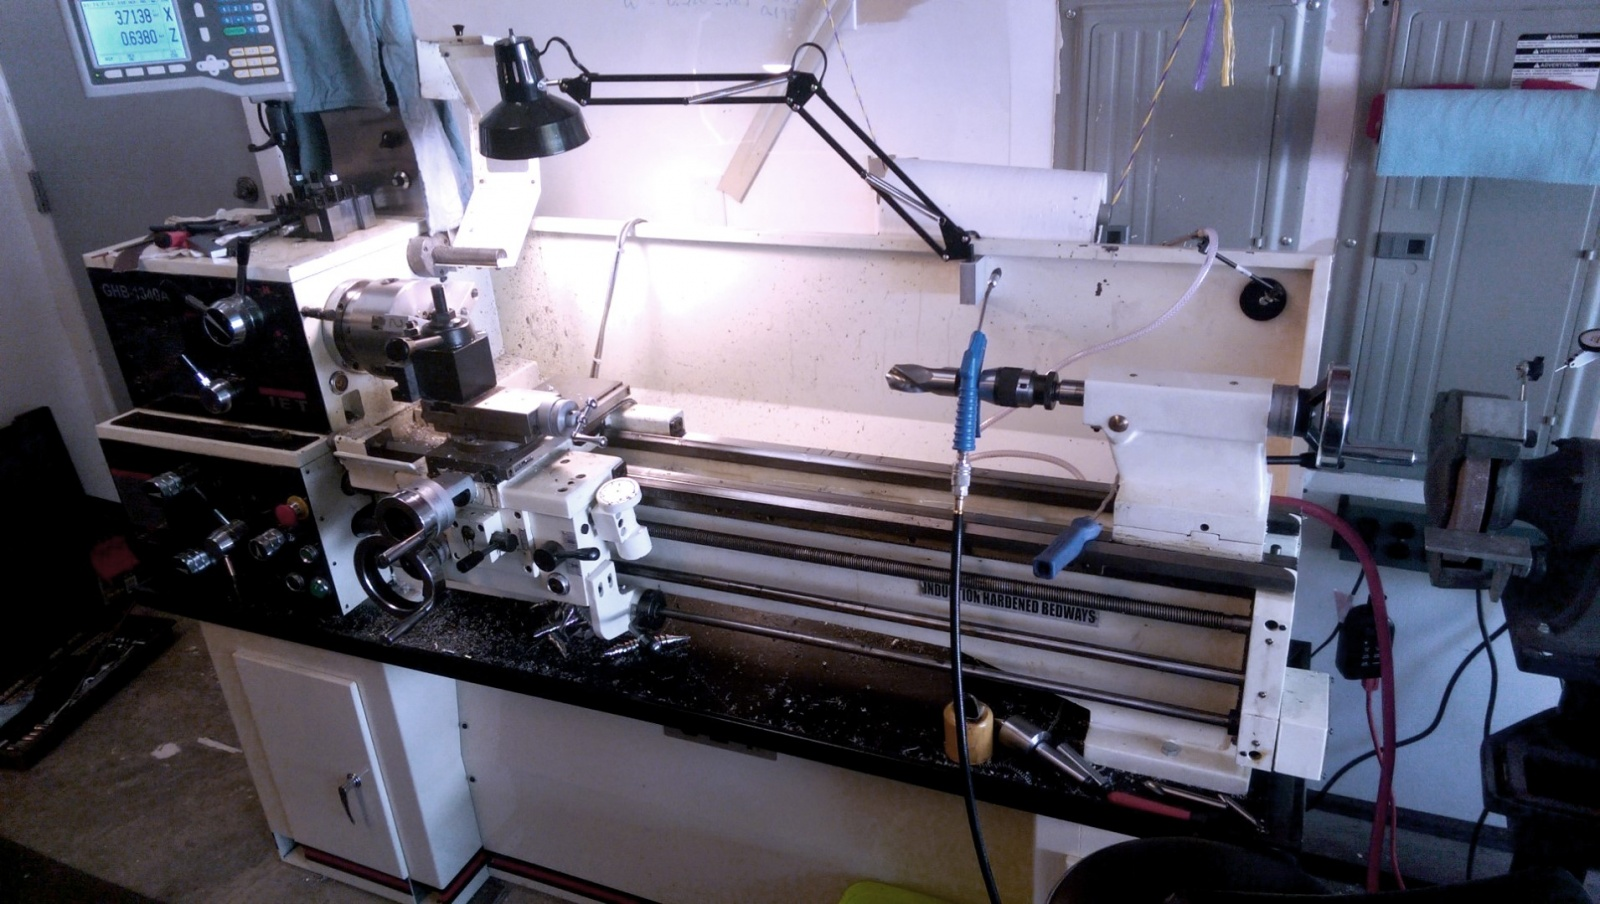 Модернизация токарного станка под работу с ЧПУ - 3